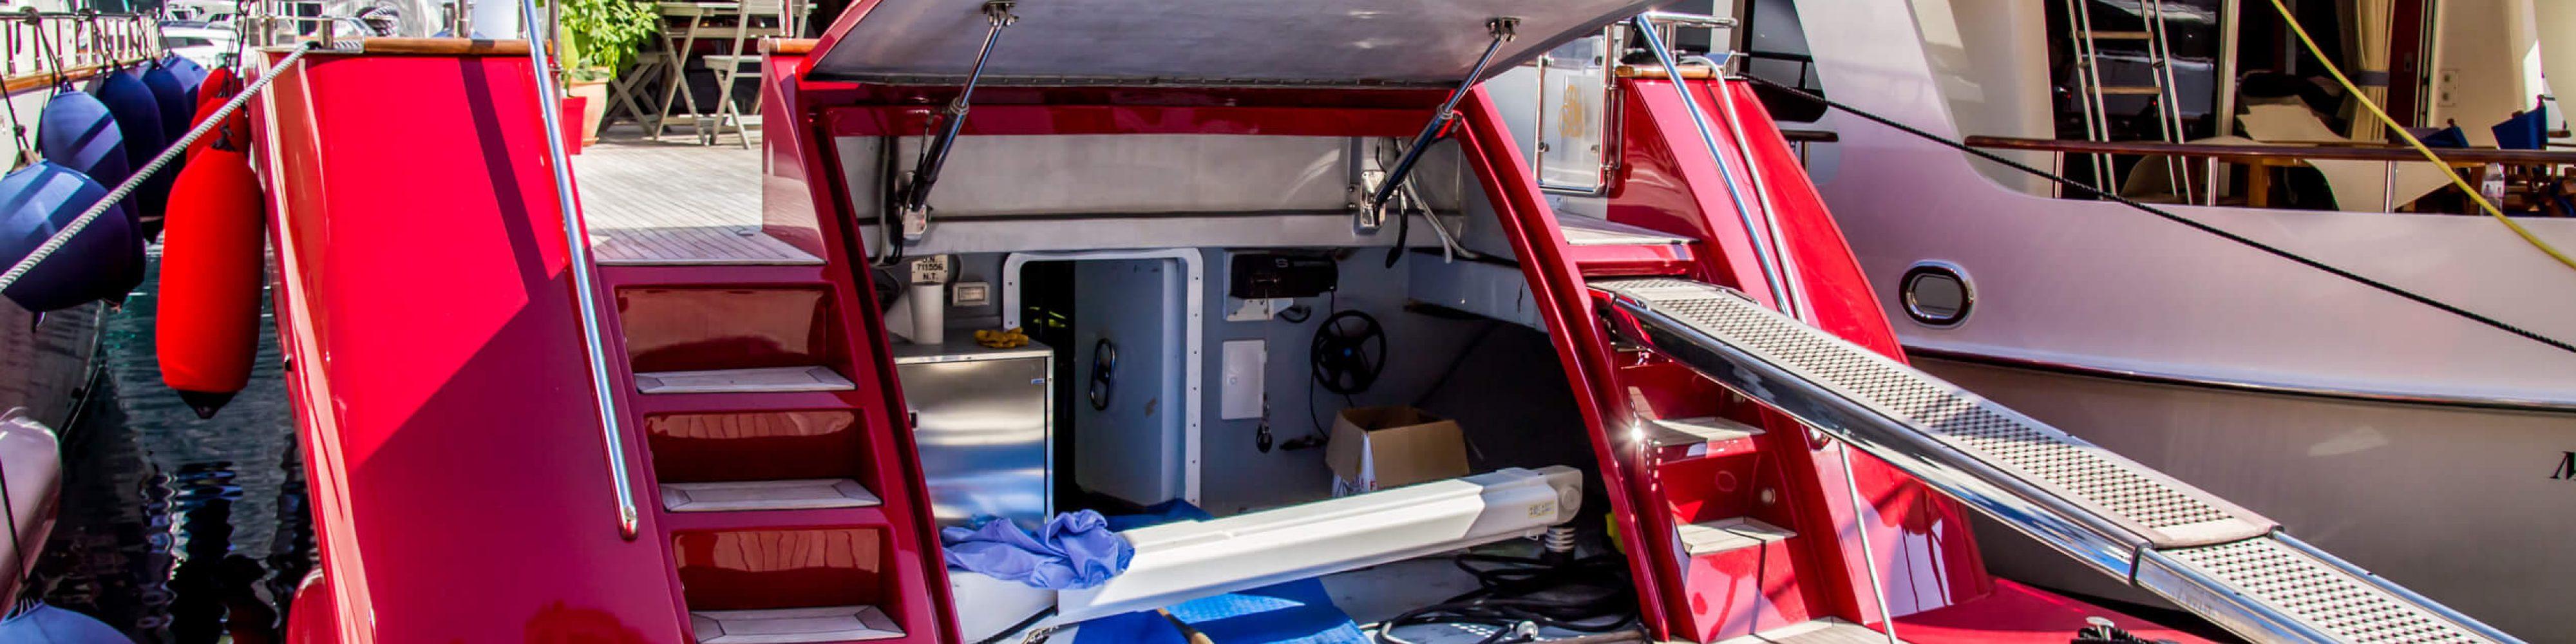 travaux petroliers yachting - Algora environnement